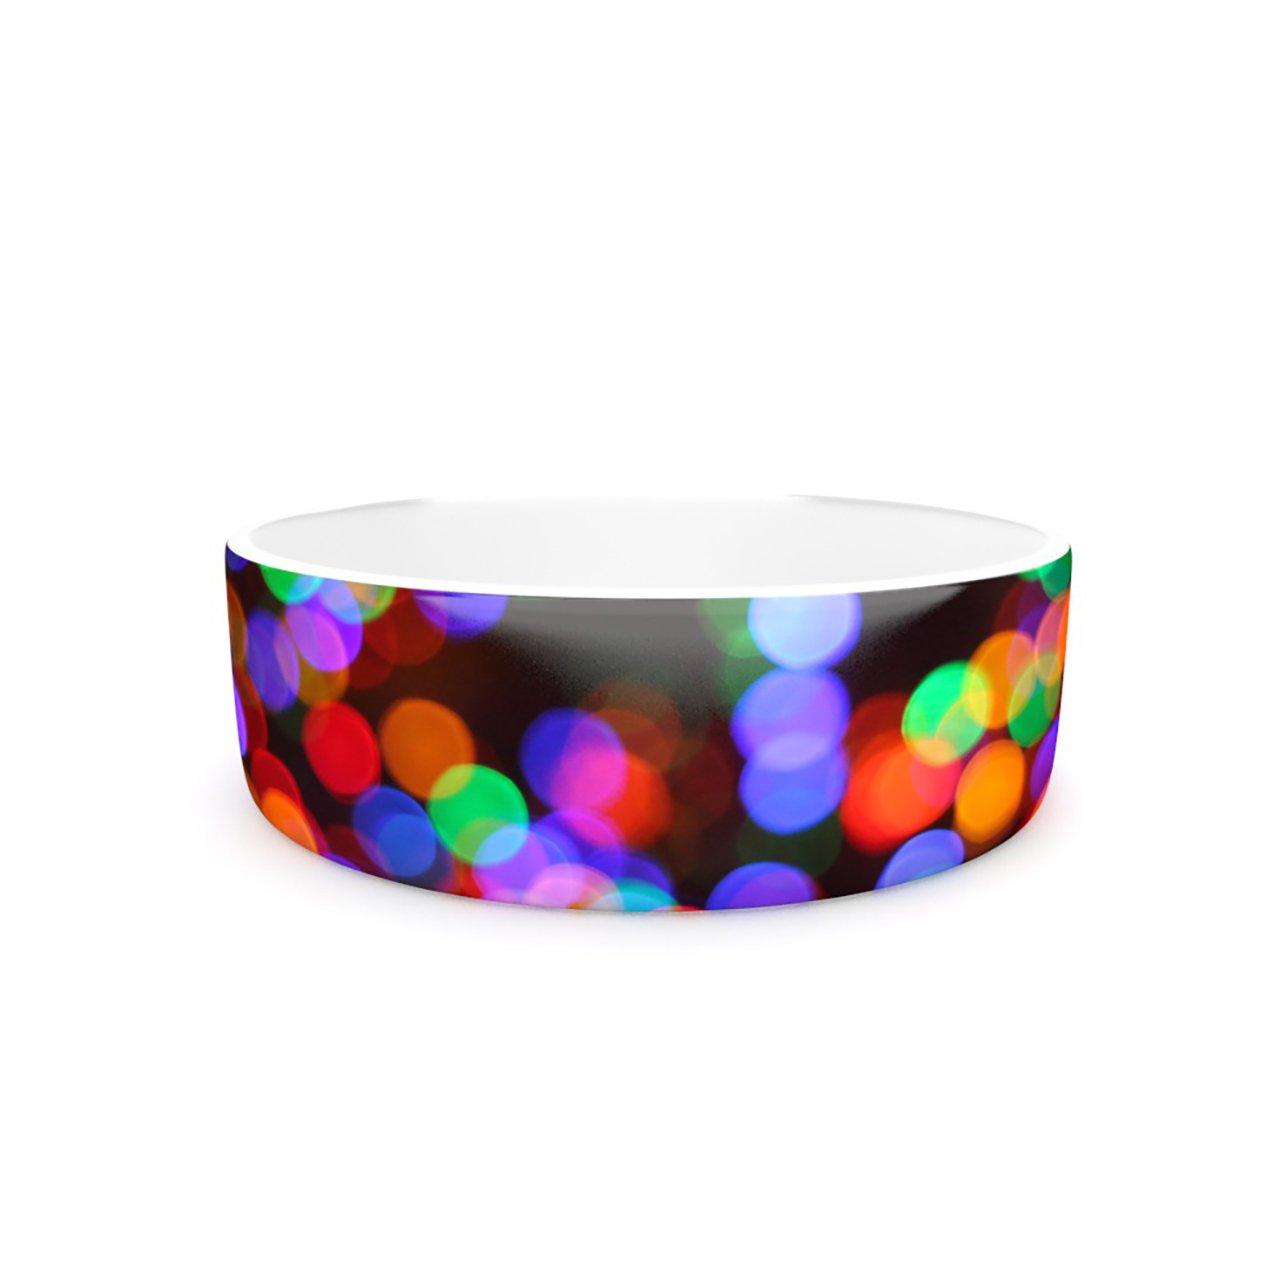 Kess InHouse Maynard Logan Lights II  Pet Bowl, 7-Inch